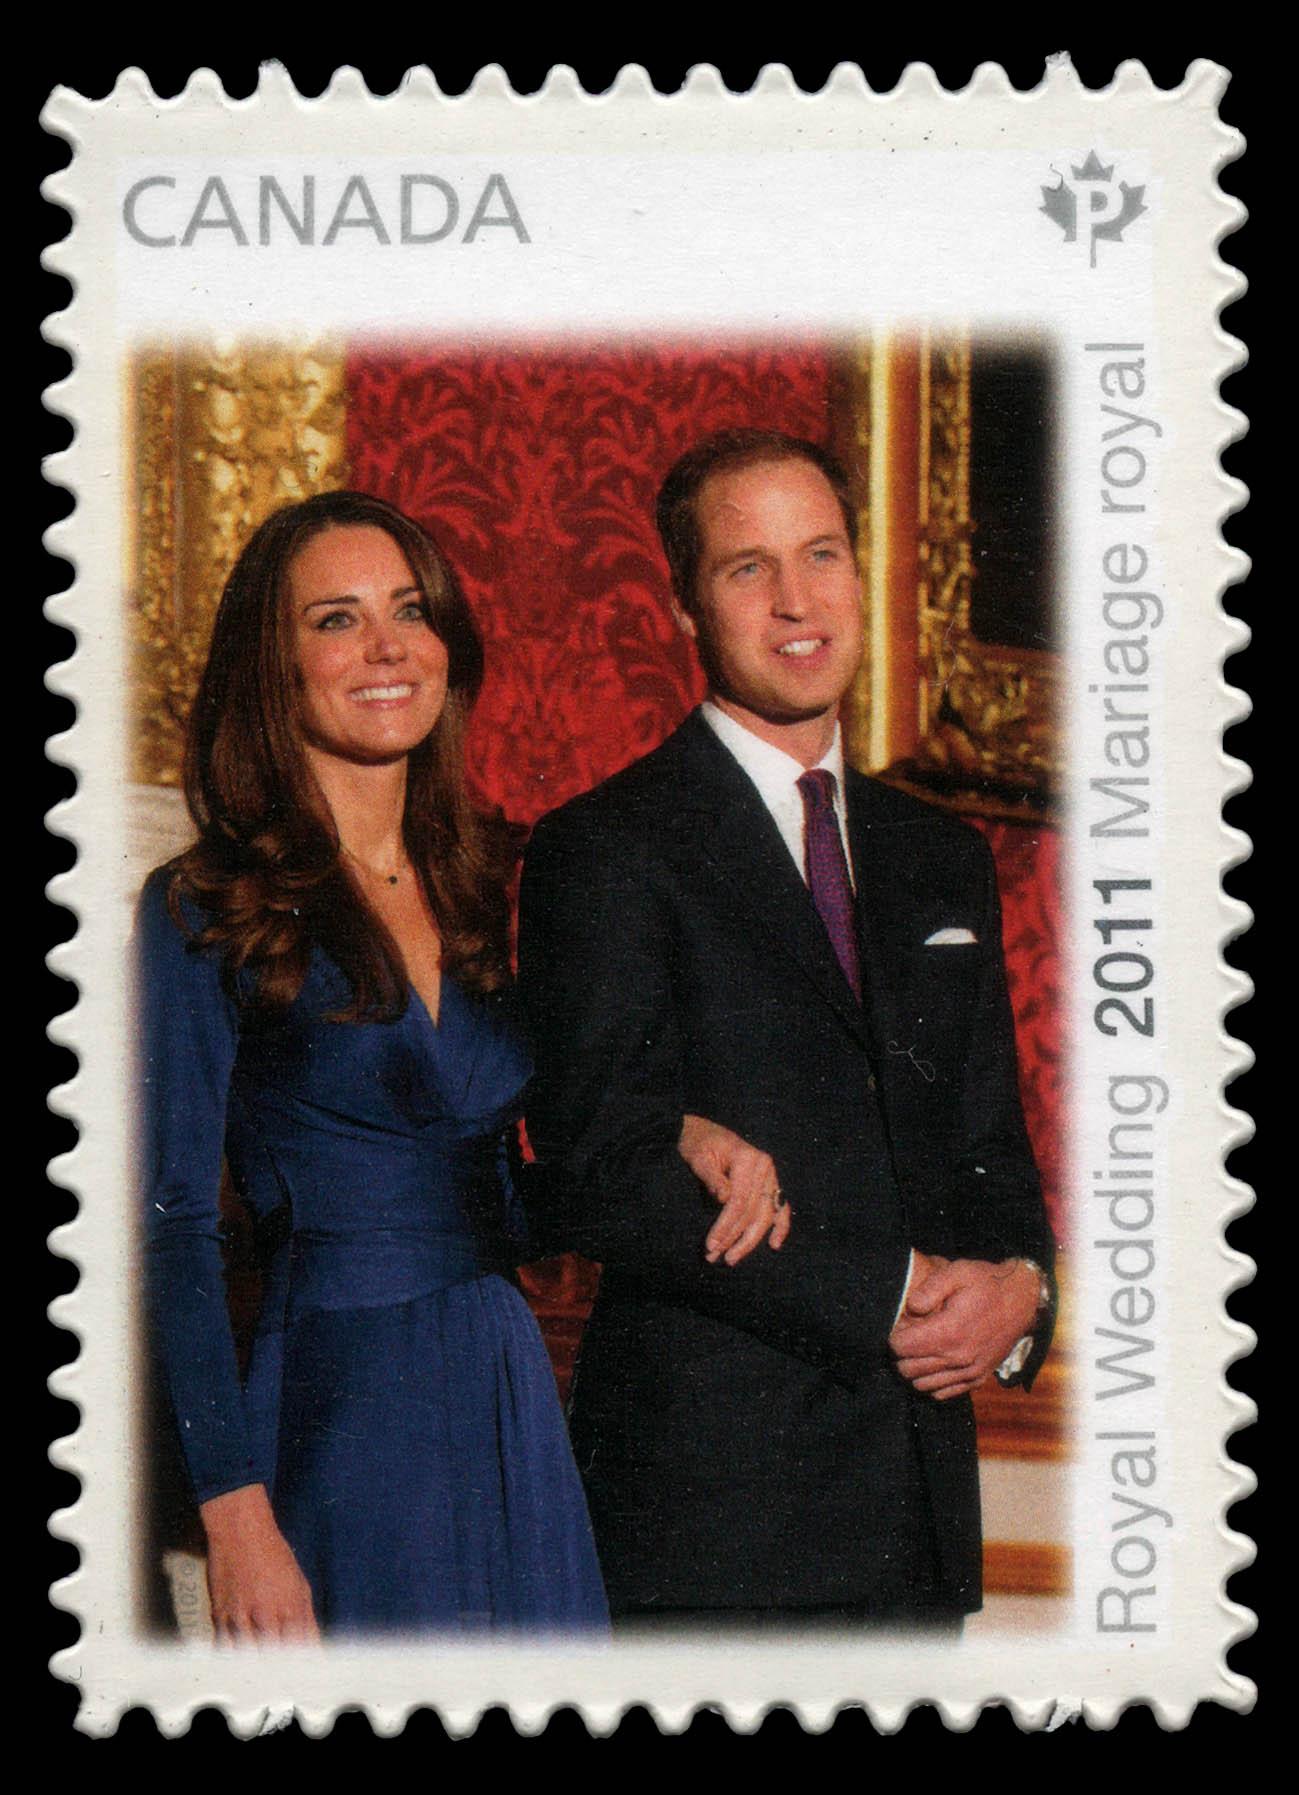 Royal Wedding 2011 - Engagement Canada Postage Stamp